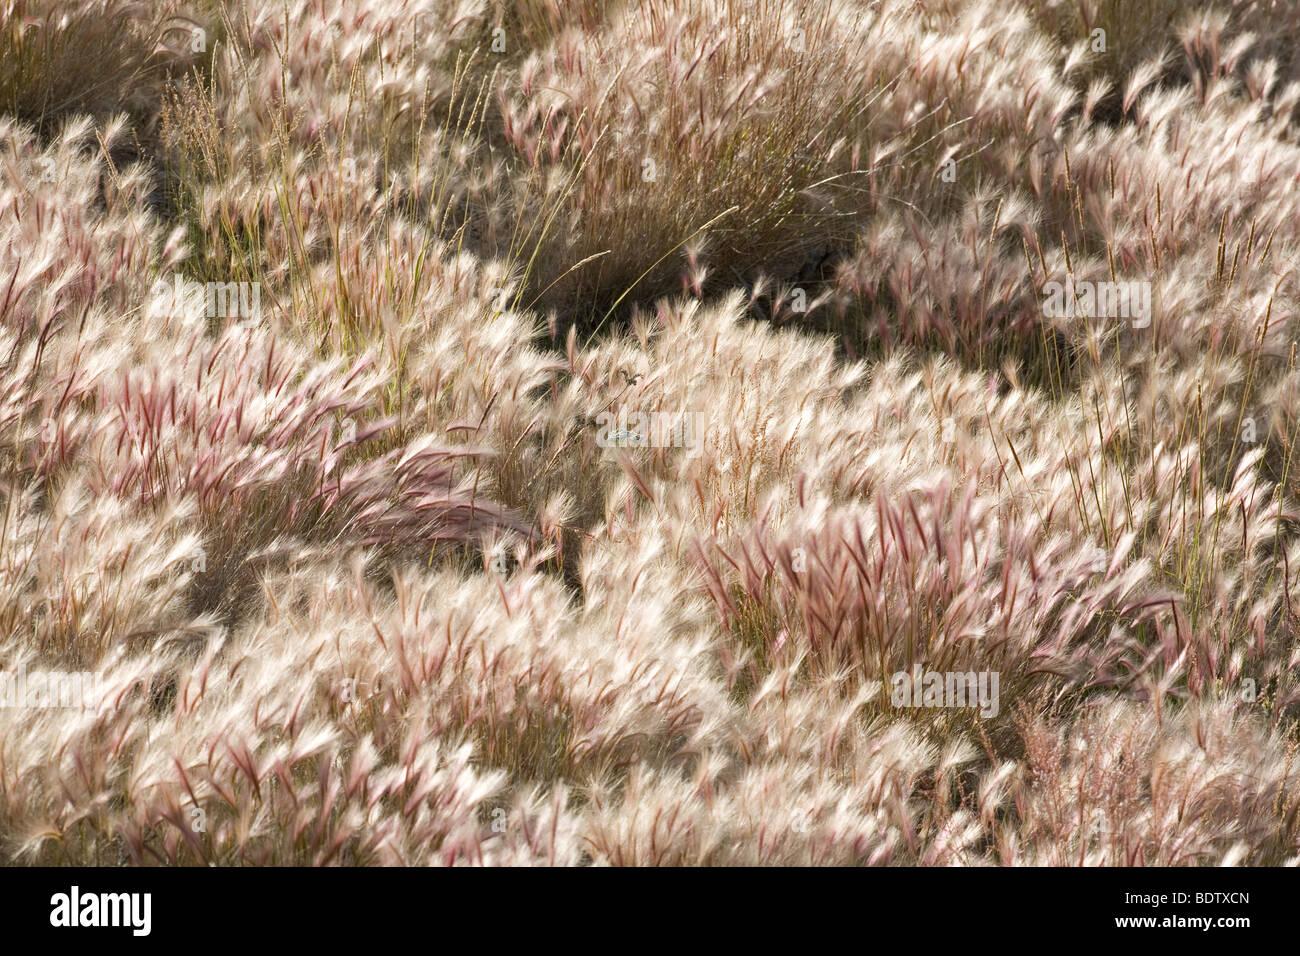 Maehnen-Gerste / Foxtail Barley / Hordeum jubatum Stock Photo